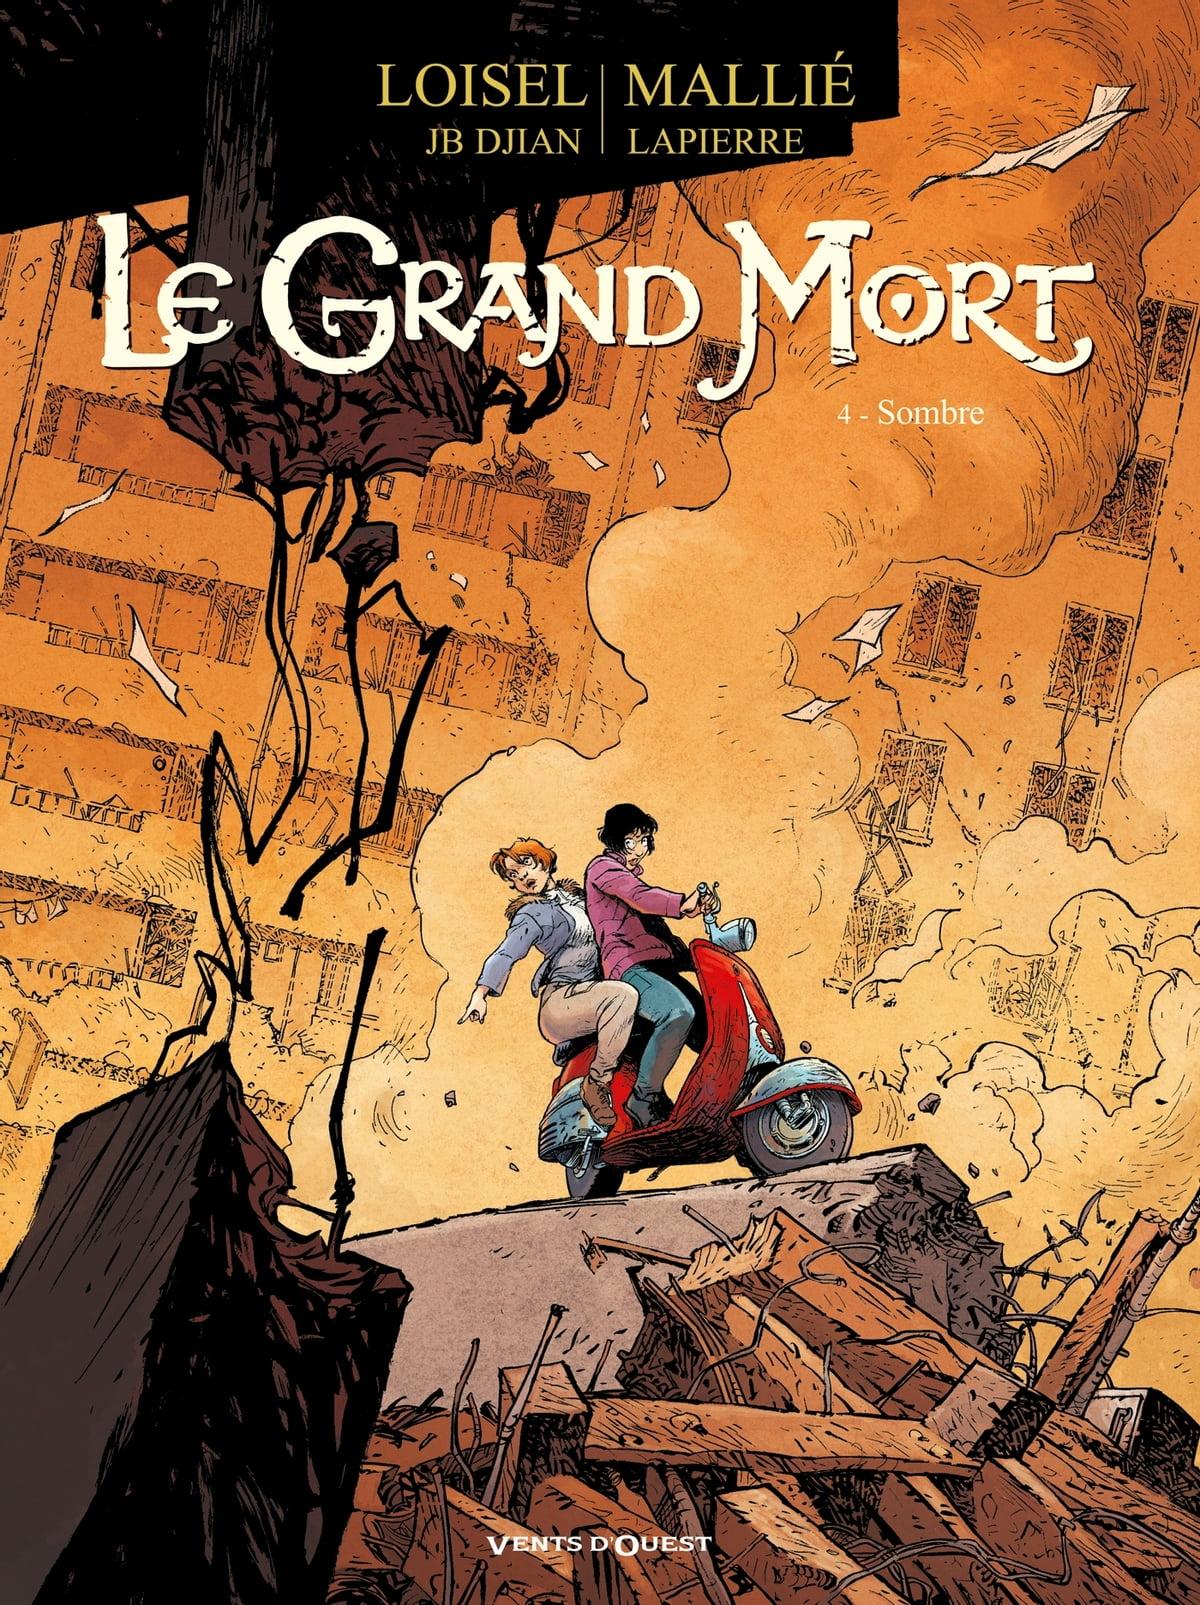 Le Grand Mort Tome 9 : grand, Grand, EBook, Régis, Loisel, 9782331035340, Rakuten, México